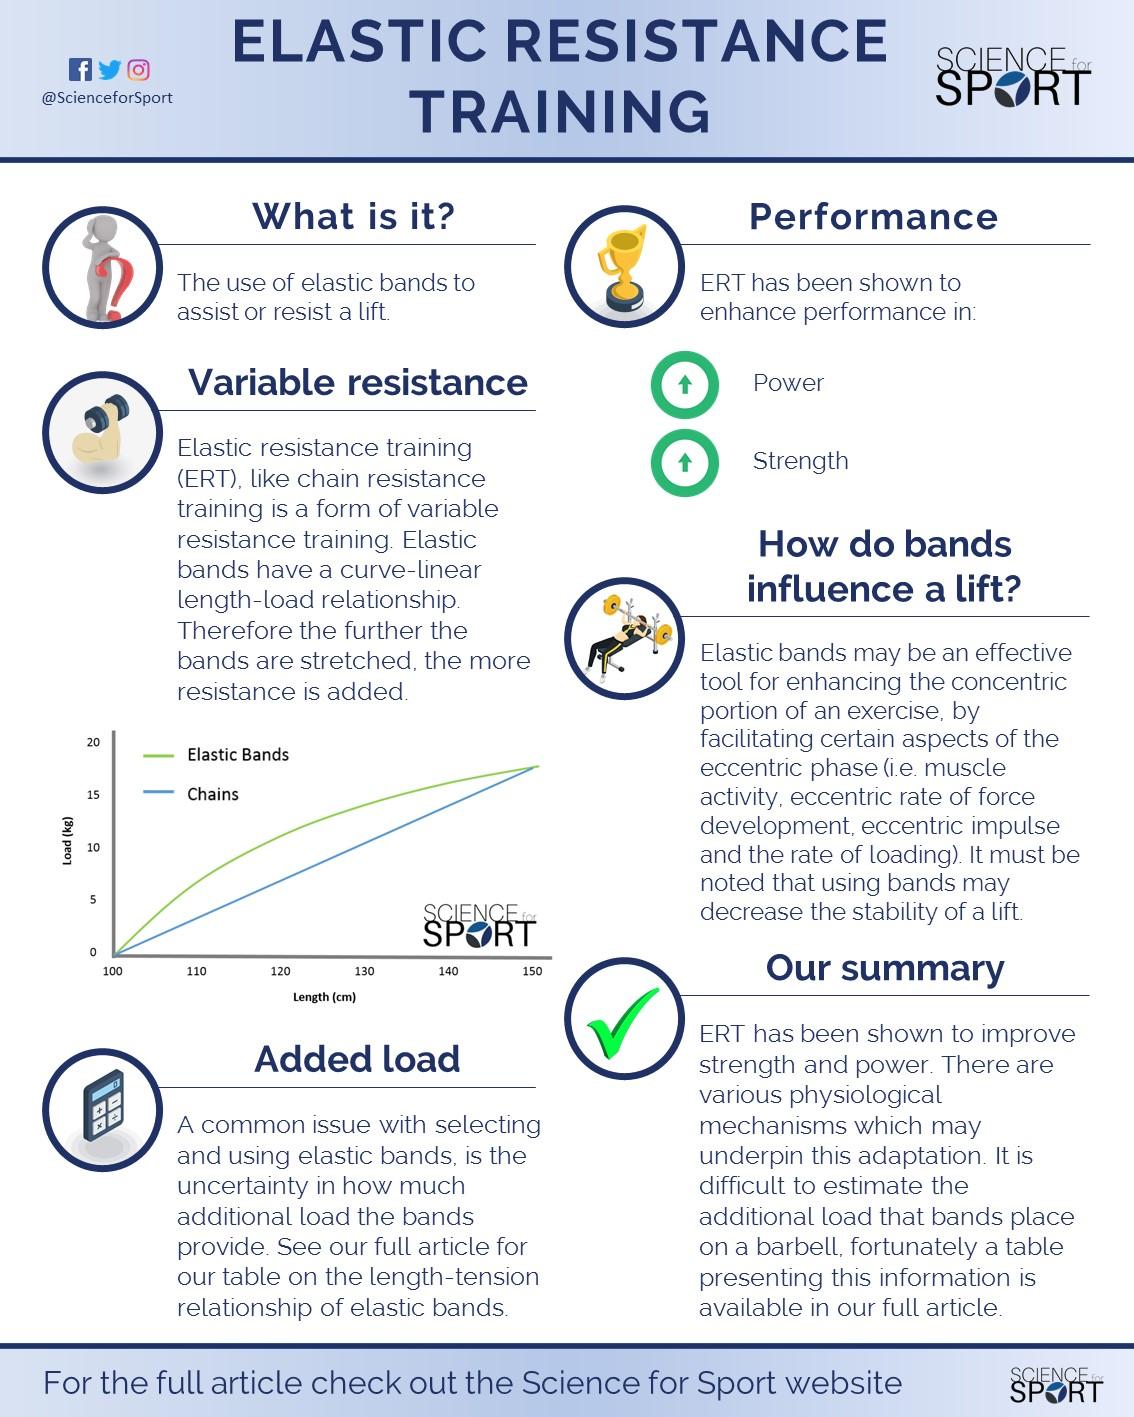 ElasticResistance Training Resistance training, Barbell